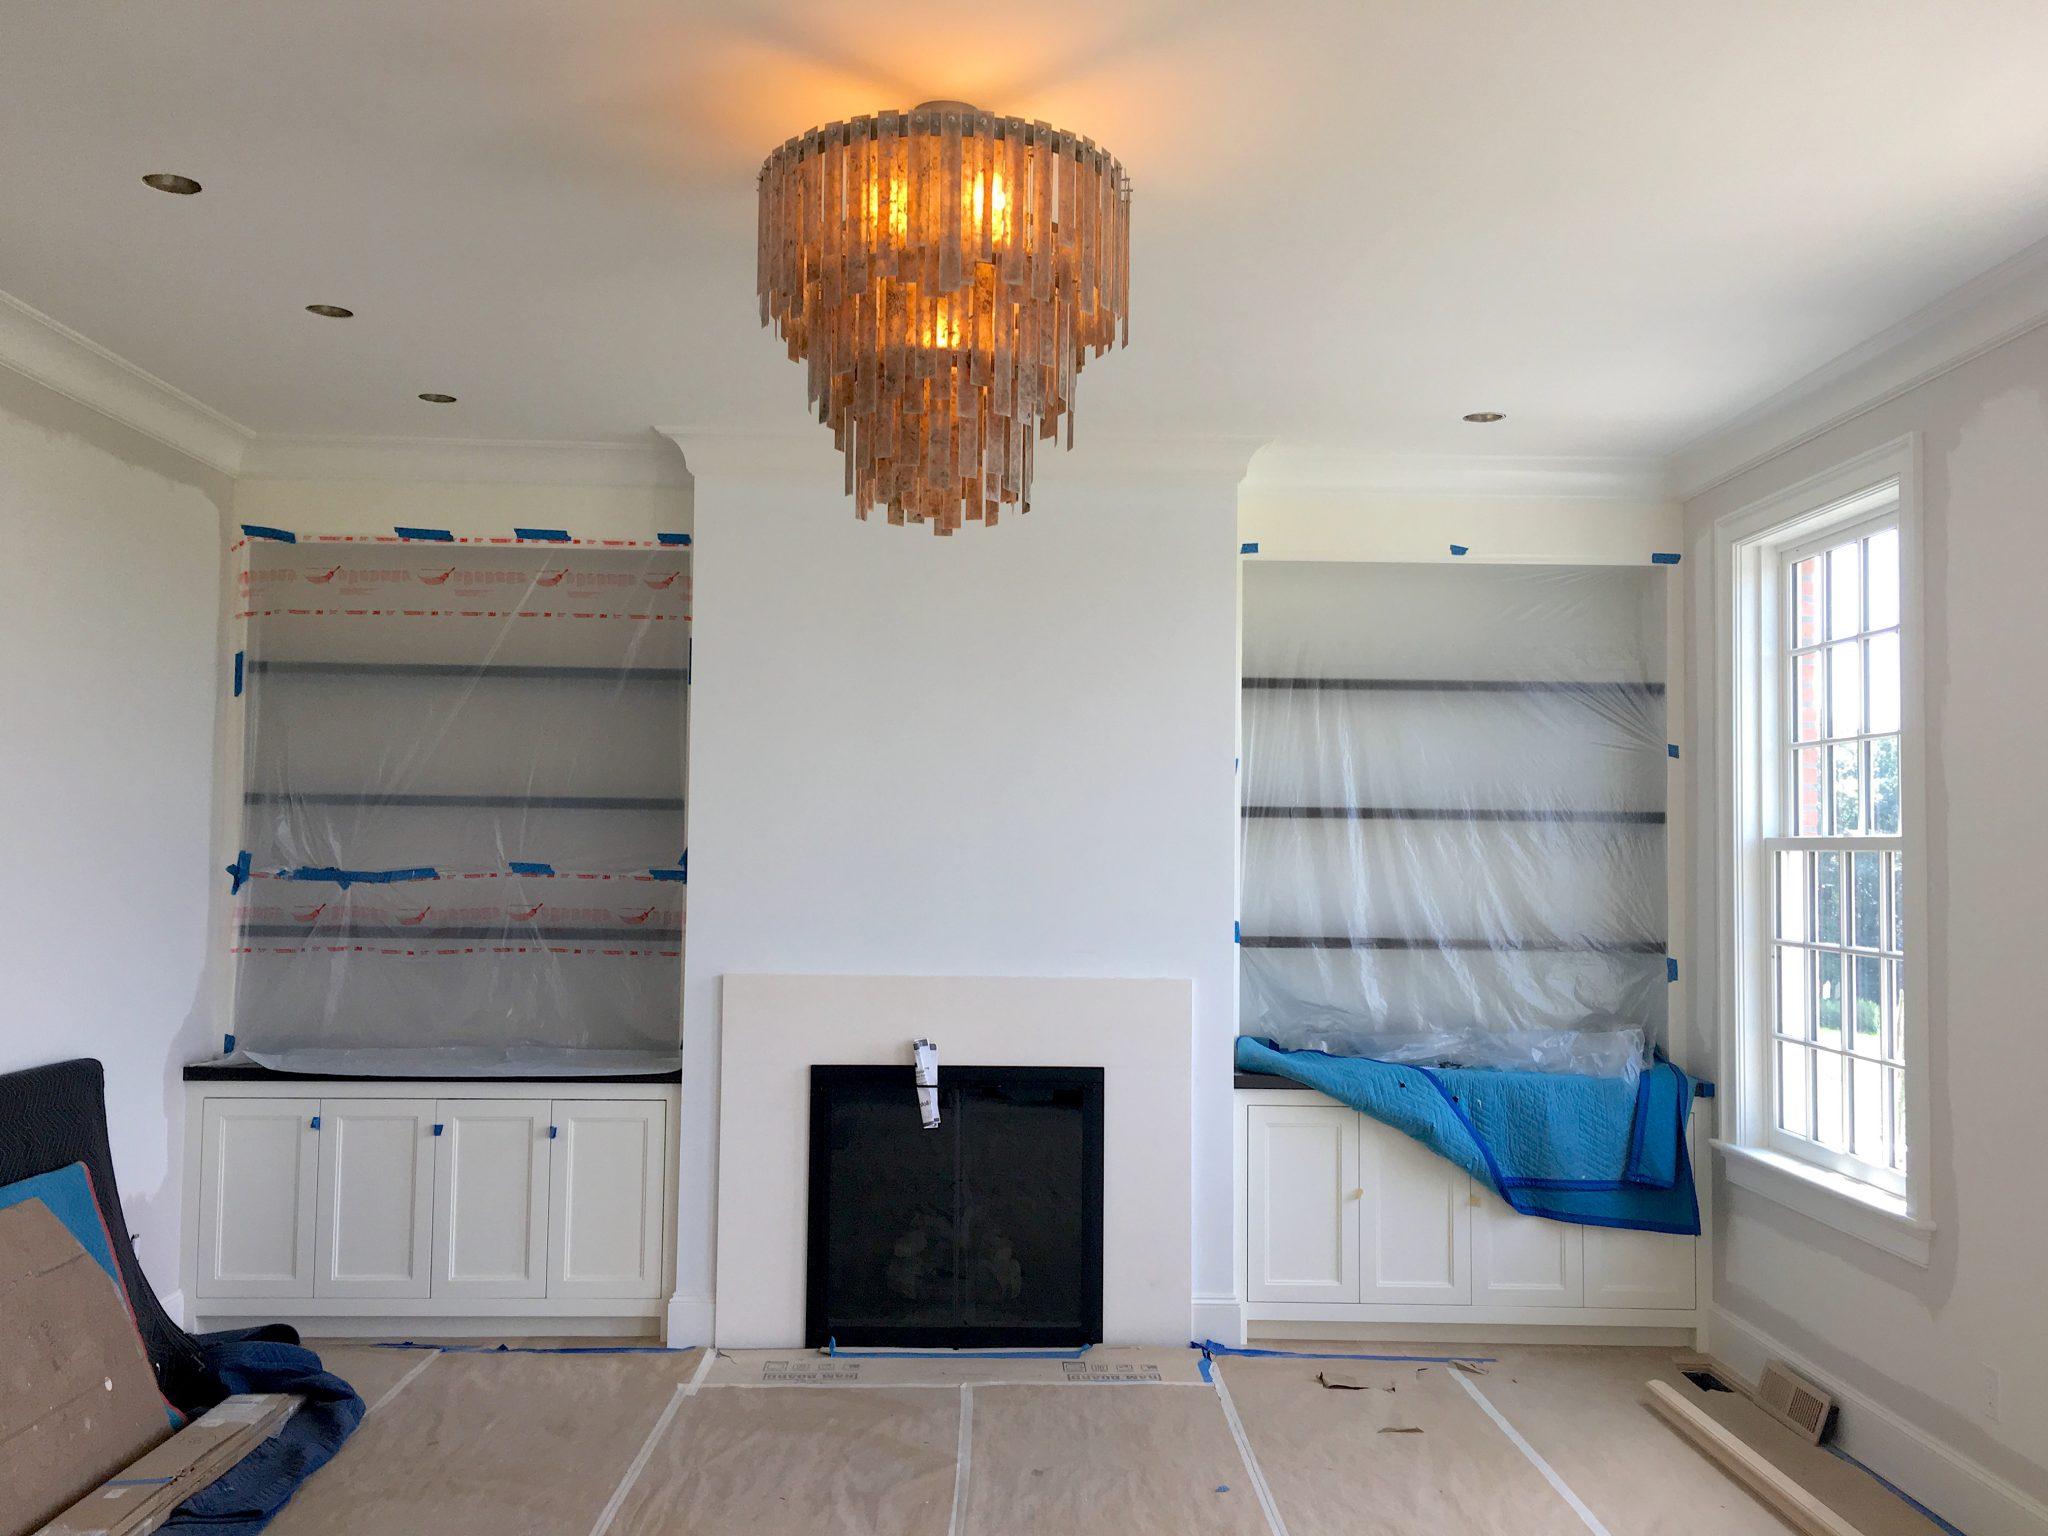 Living Room - Dutchess County Home Renovation